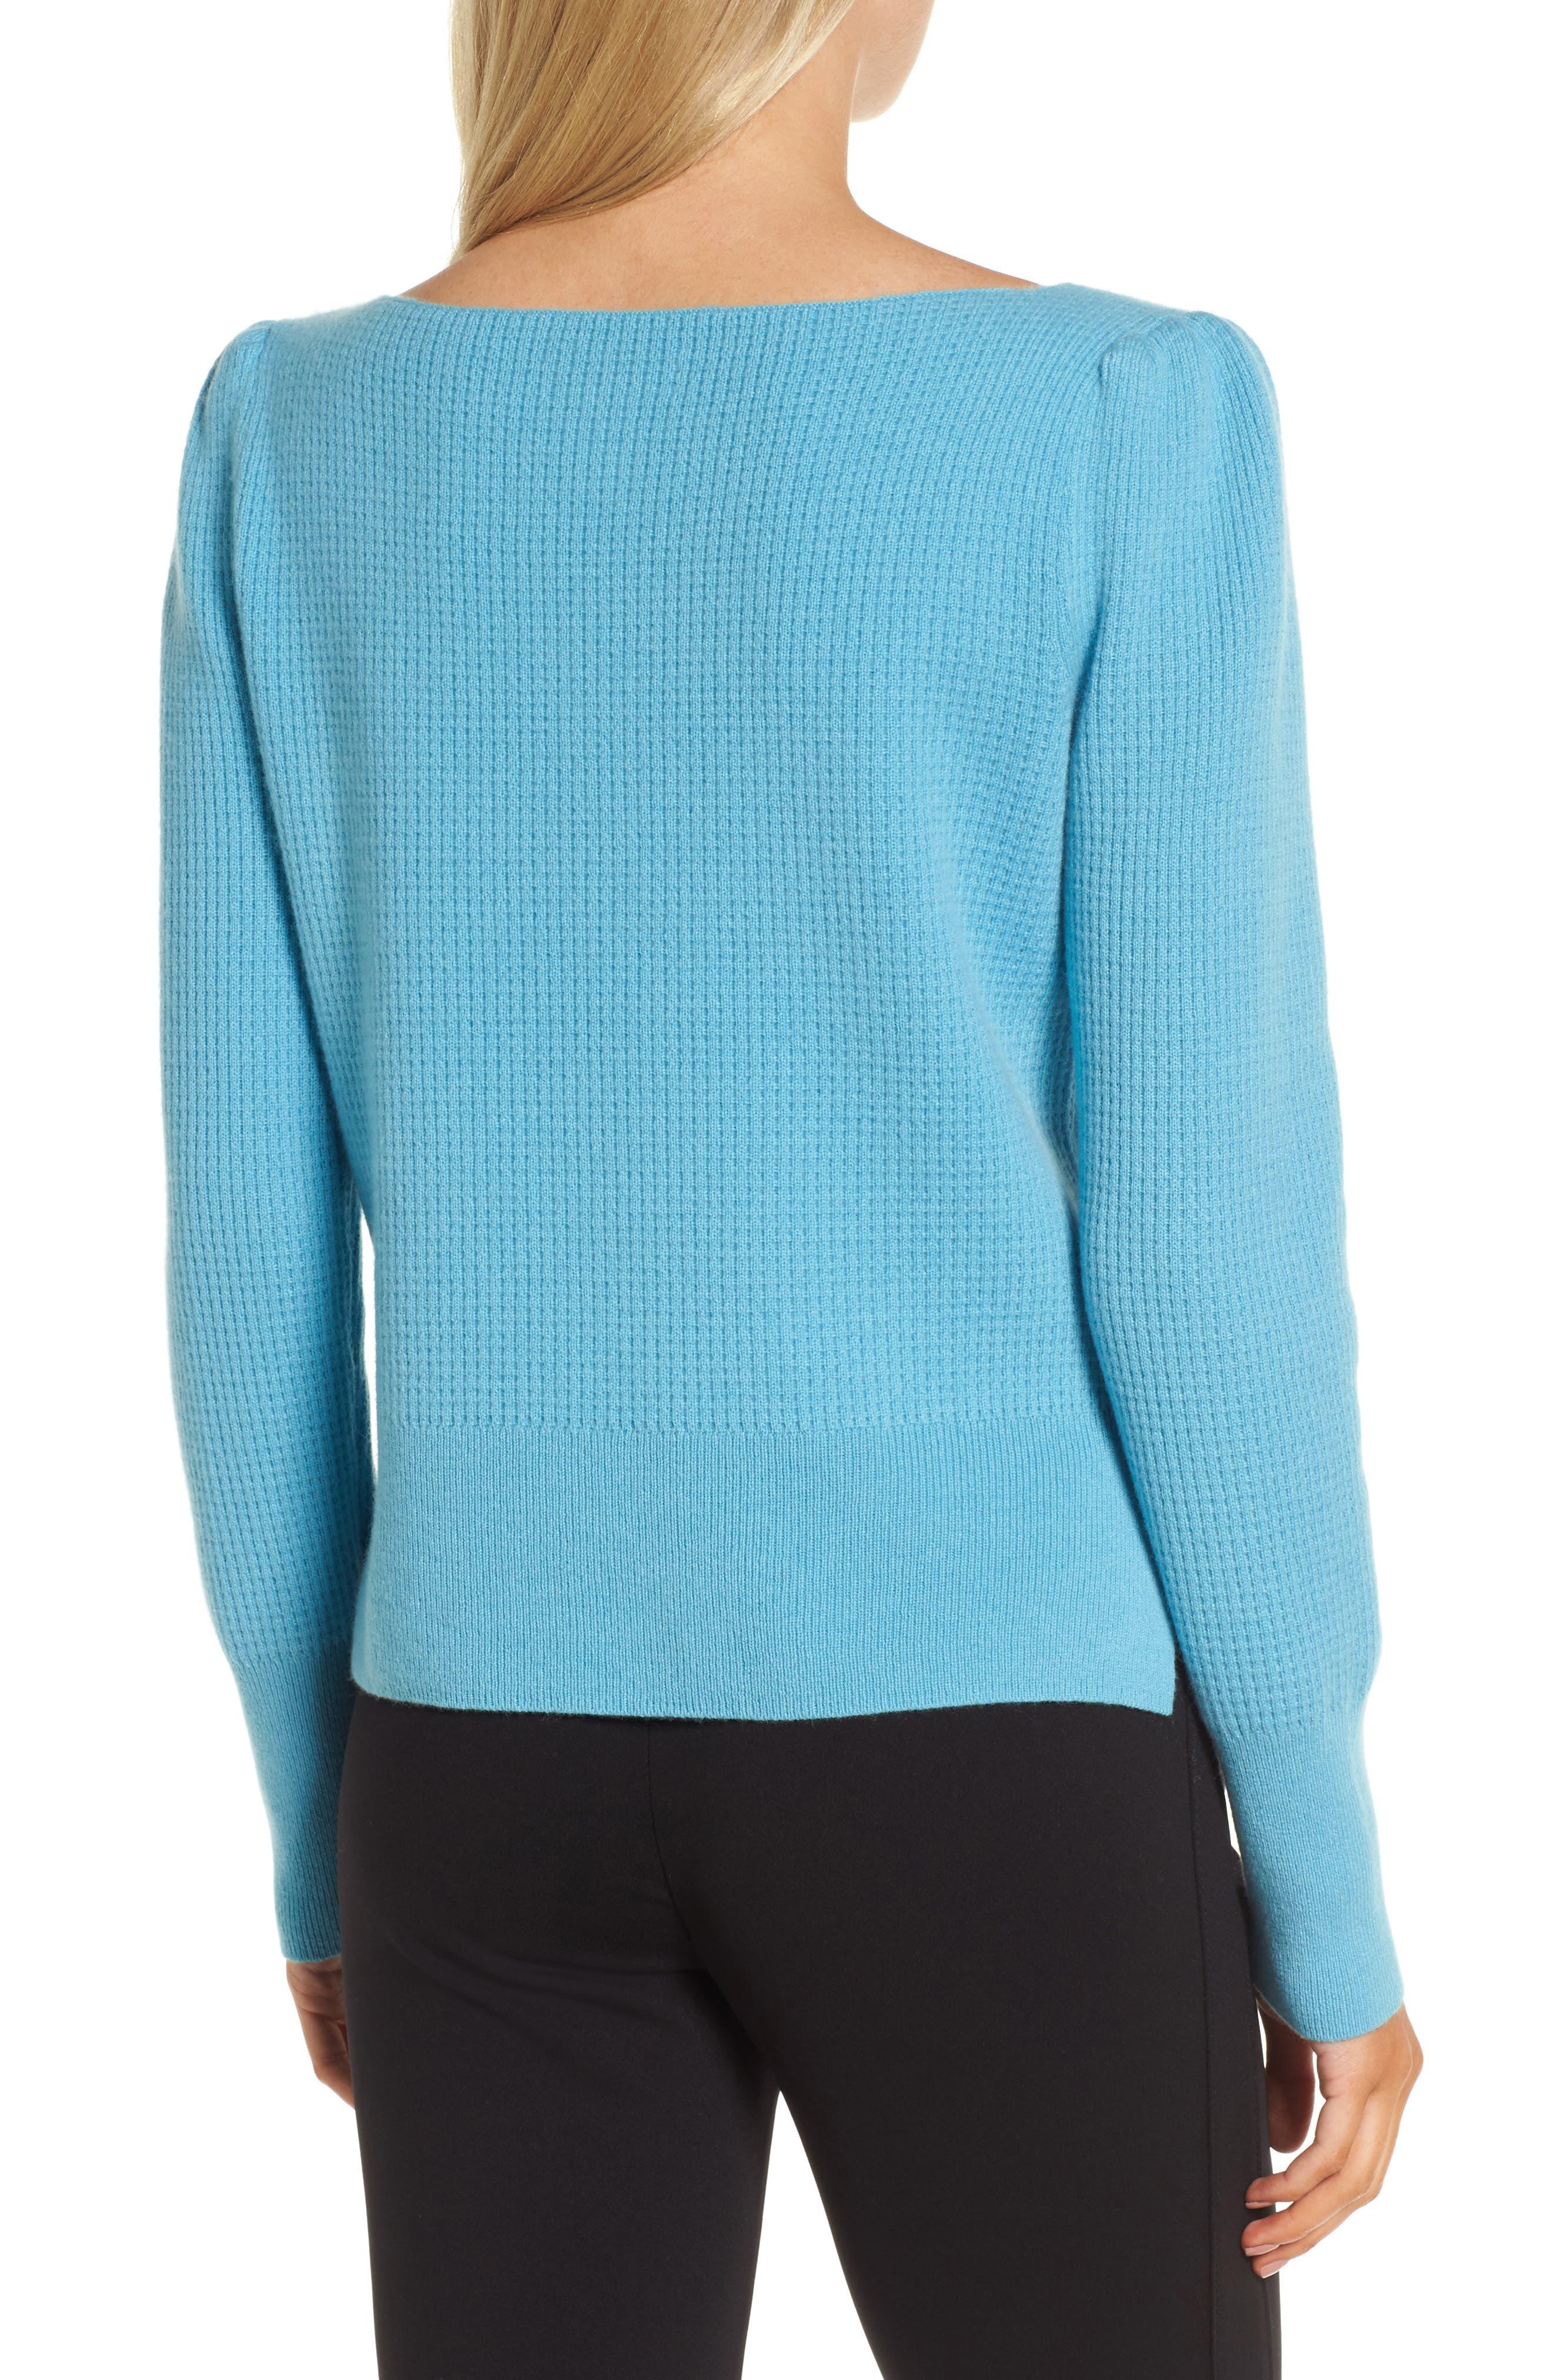 Waffle Stitch Cashmere Sweater,                             Alternate thumbnail 3, color,